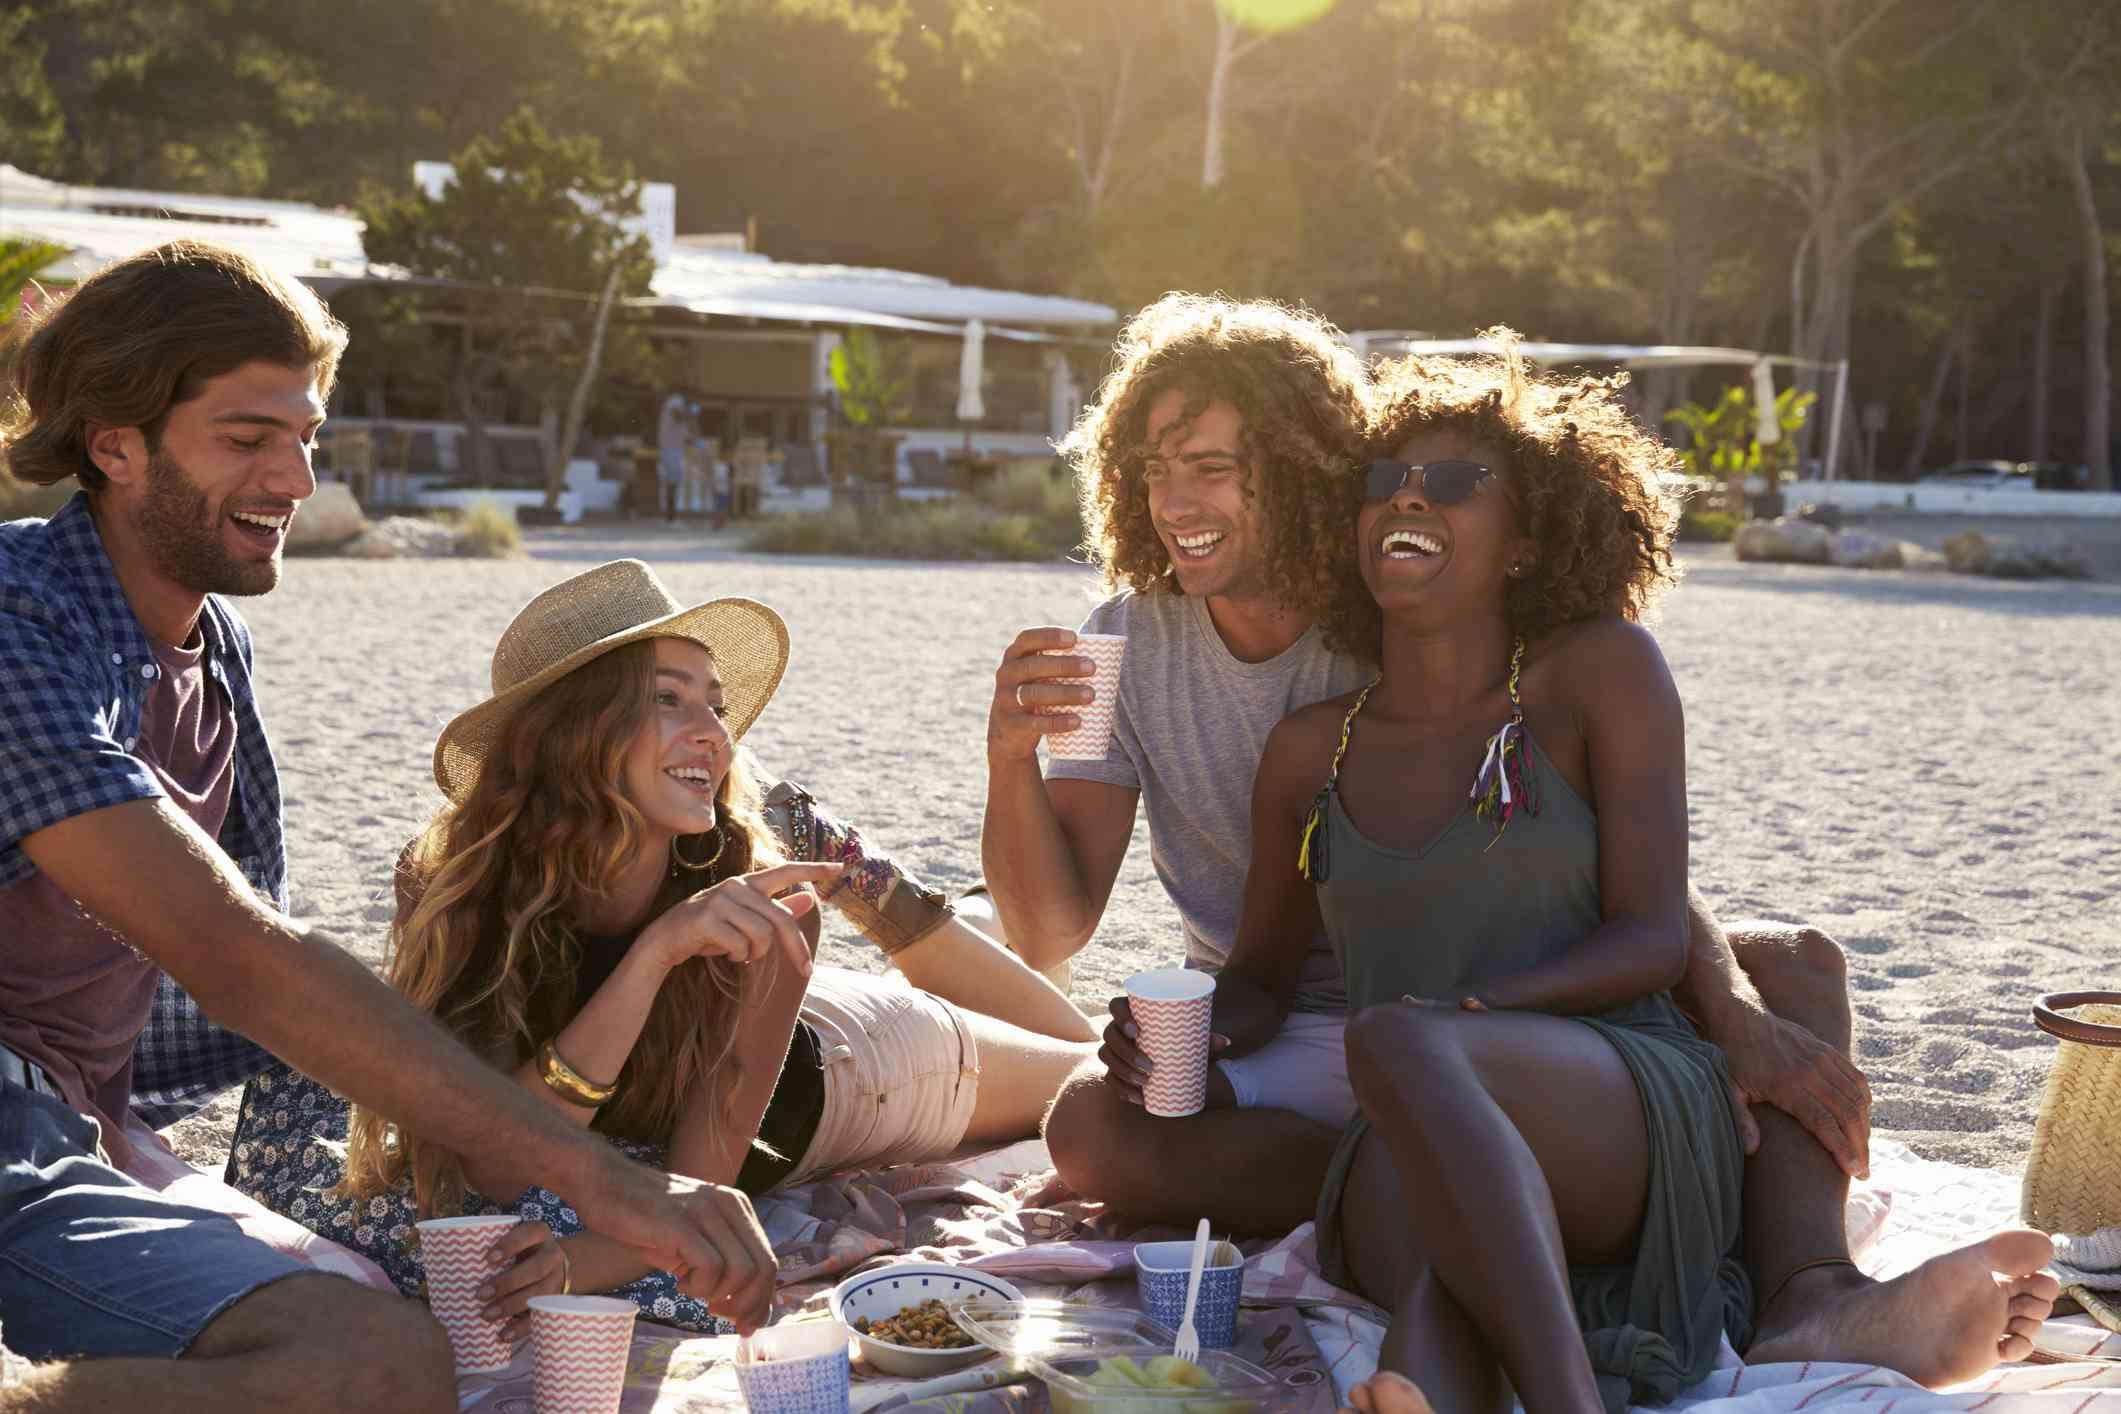 Four friends having a picnic on the beach